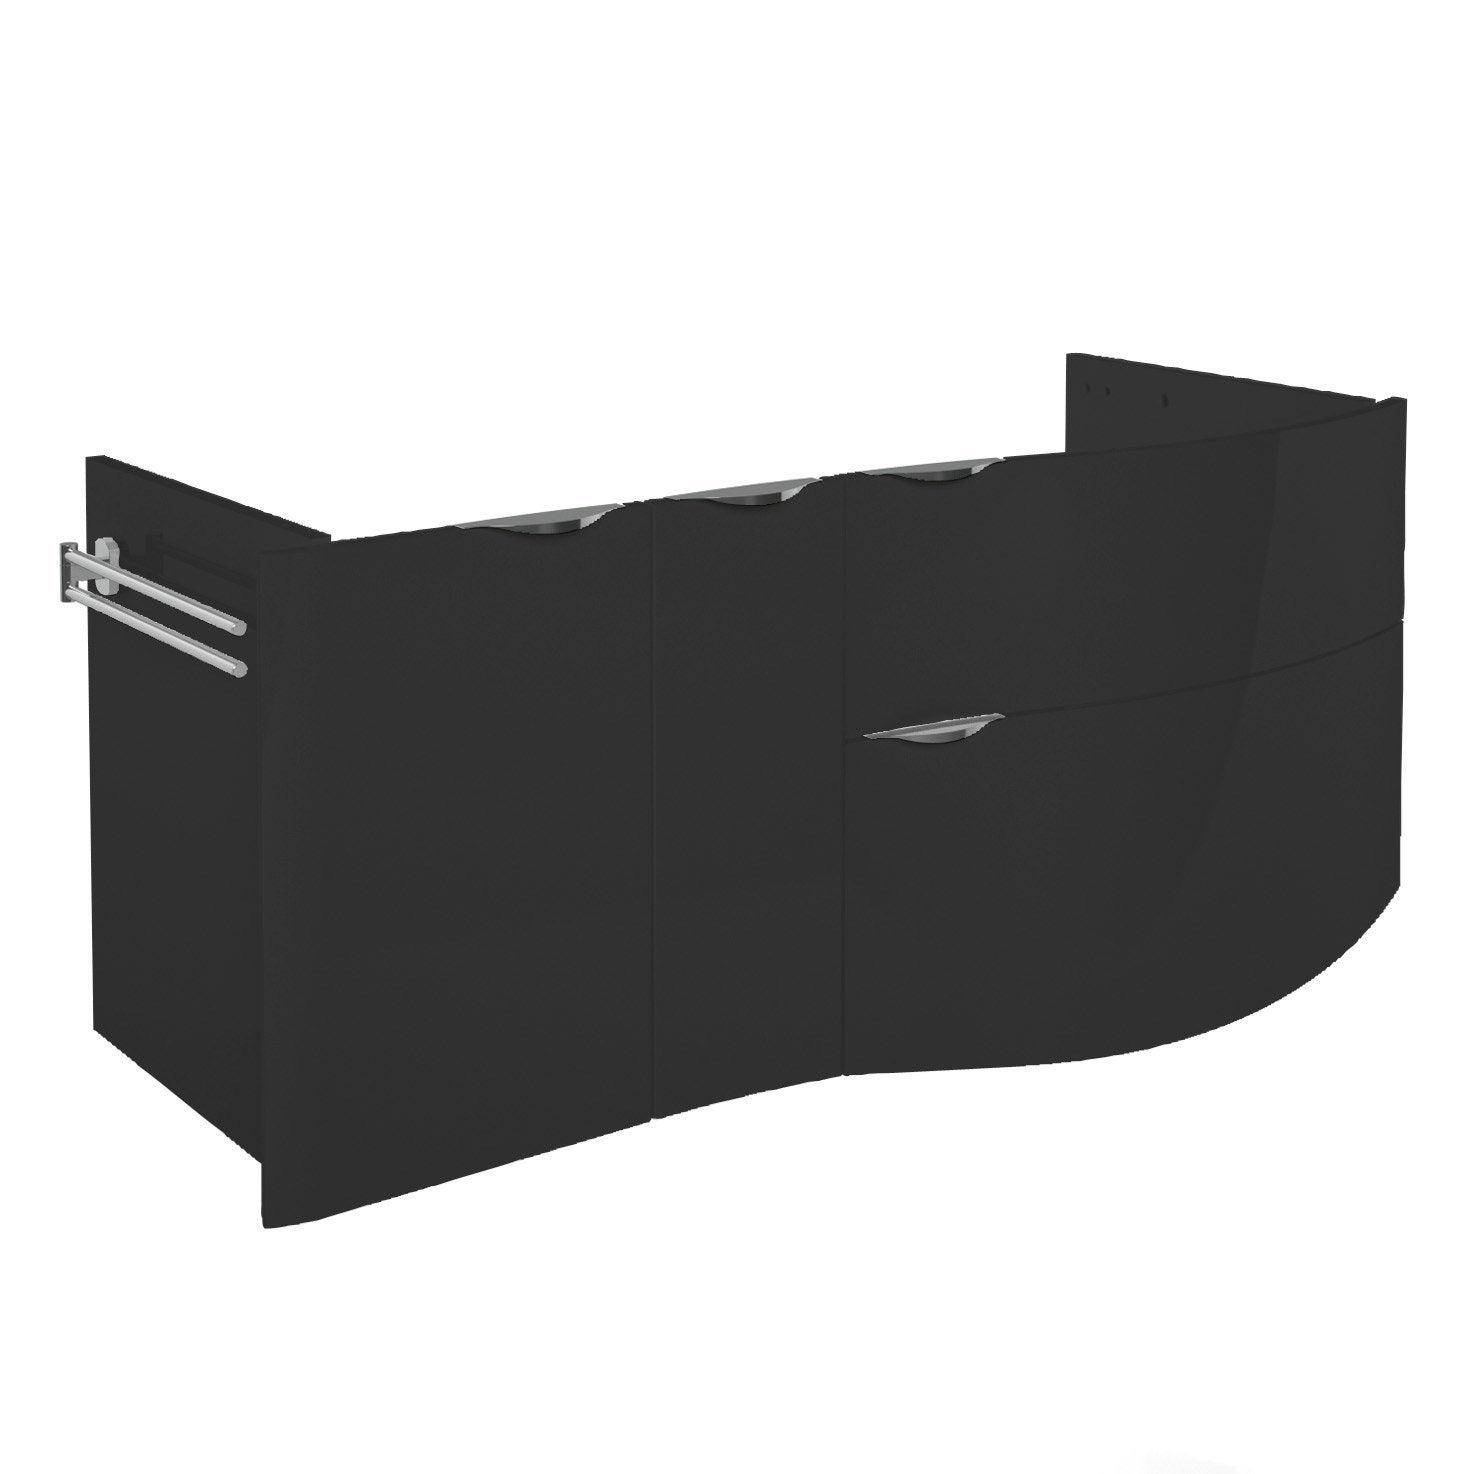 meuble sous vasque x x cm noir elegance leroy merlin. Black Bedroom Furniture Sets. Home Design Ideas